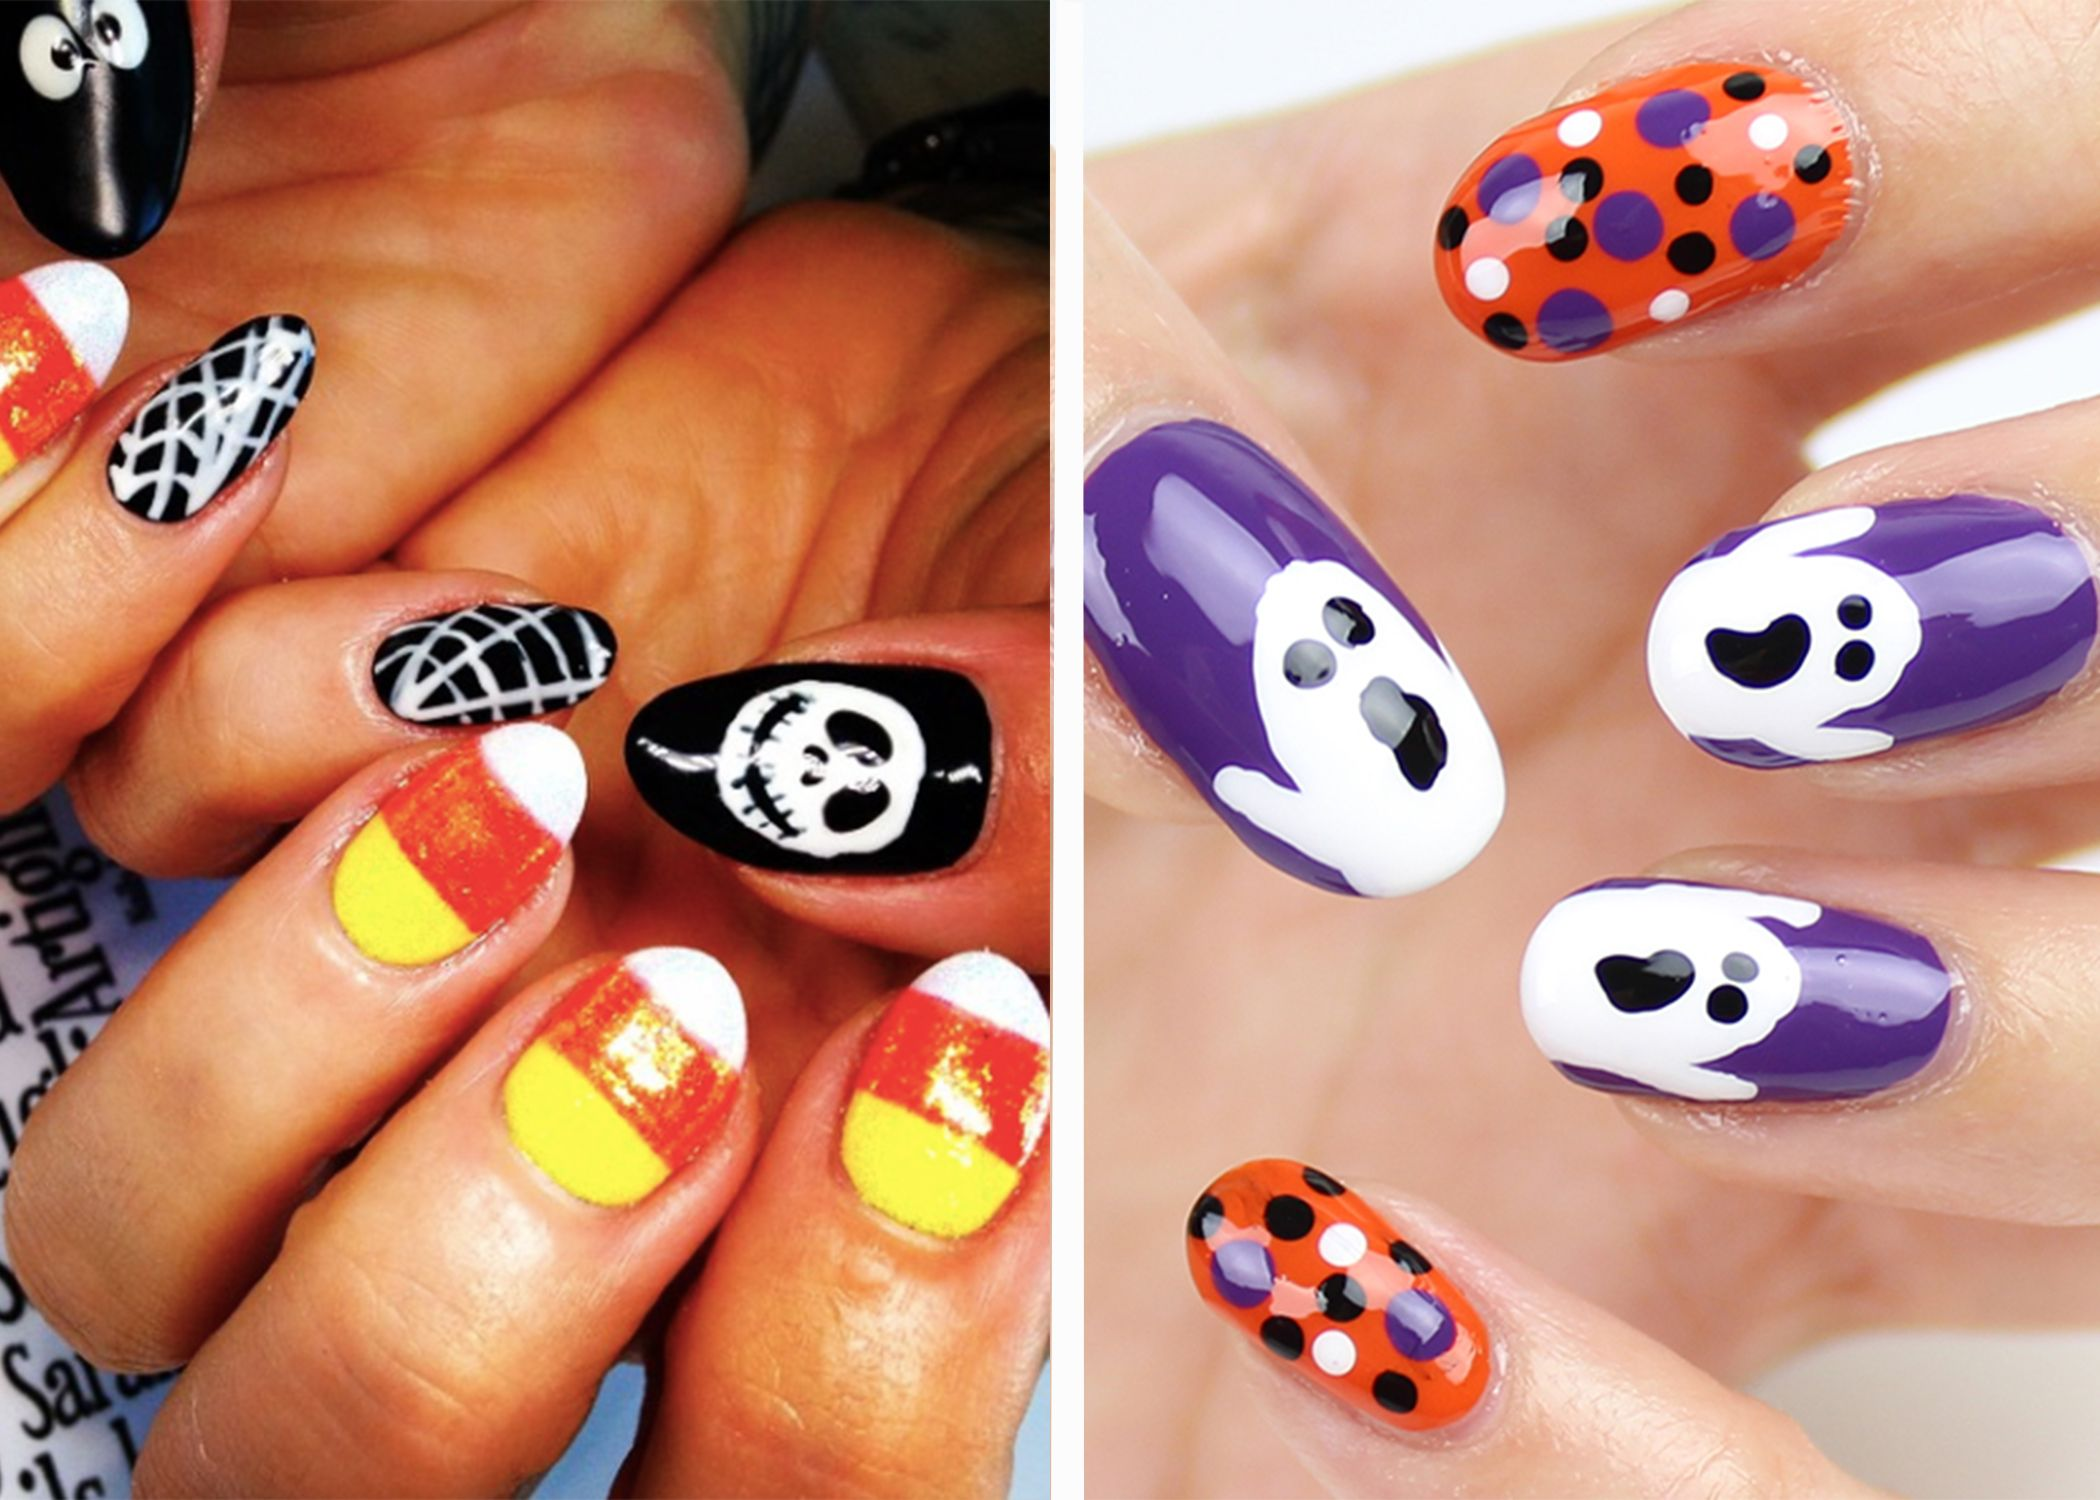 Easy To Do Halloween Nails.23 Spooktacular Halloween Nail Art